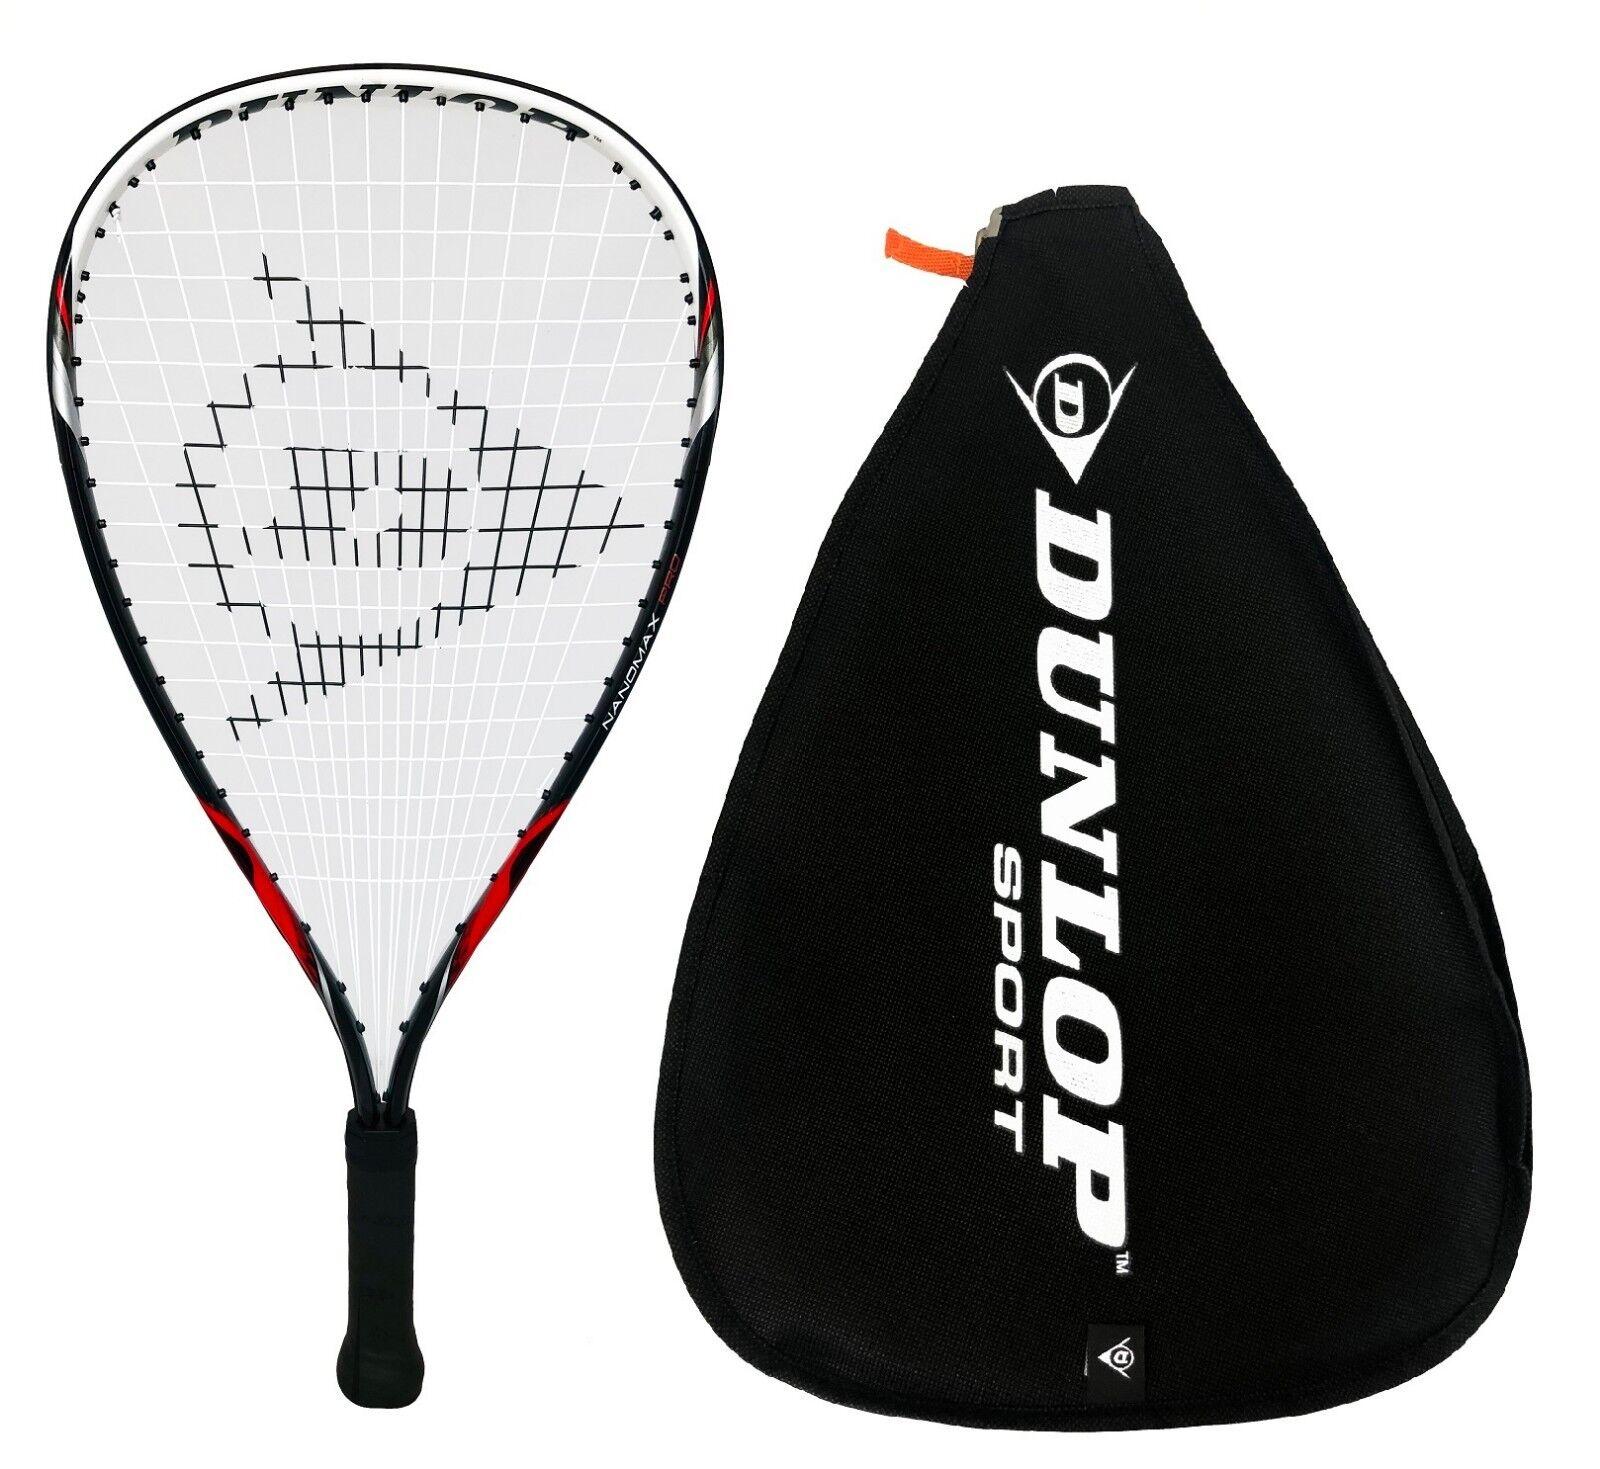 Dunlop Biotec Titanium Racketball Raquette 3 Balles